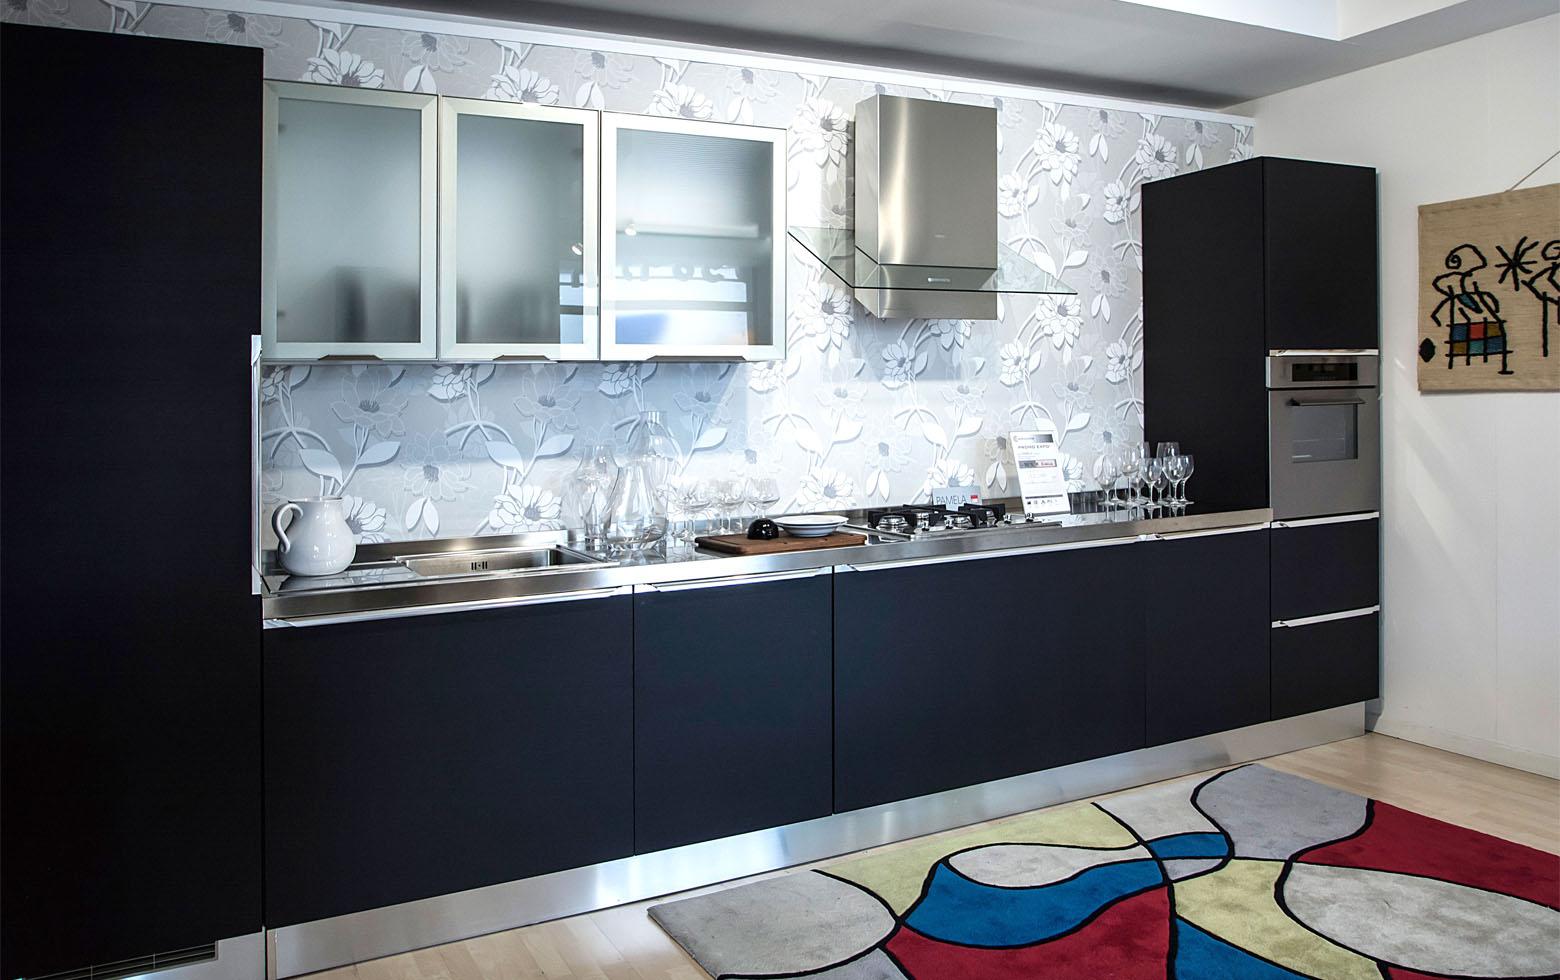 Offerta speciale cucine lube centro cucina - Lunghezza cucina ...